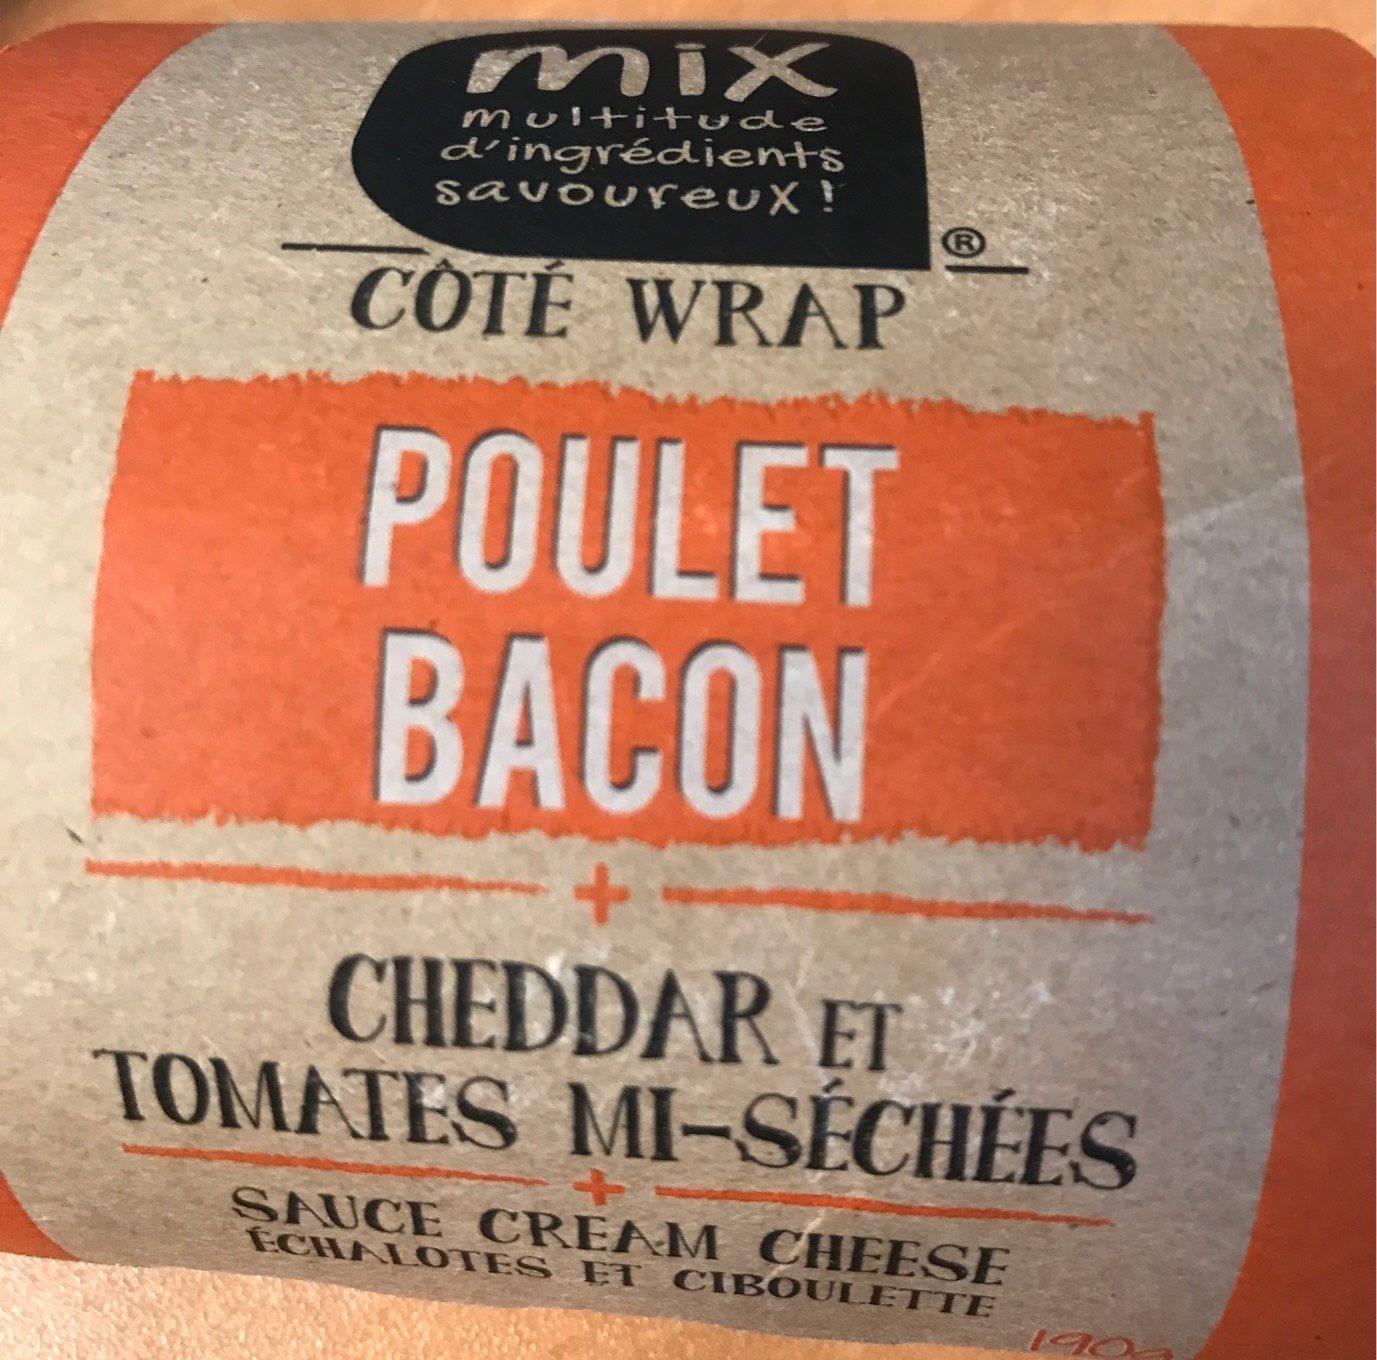 Wrap Poulet Bacon, 190g - Produit - fr